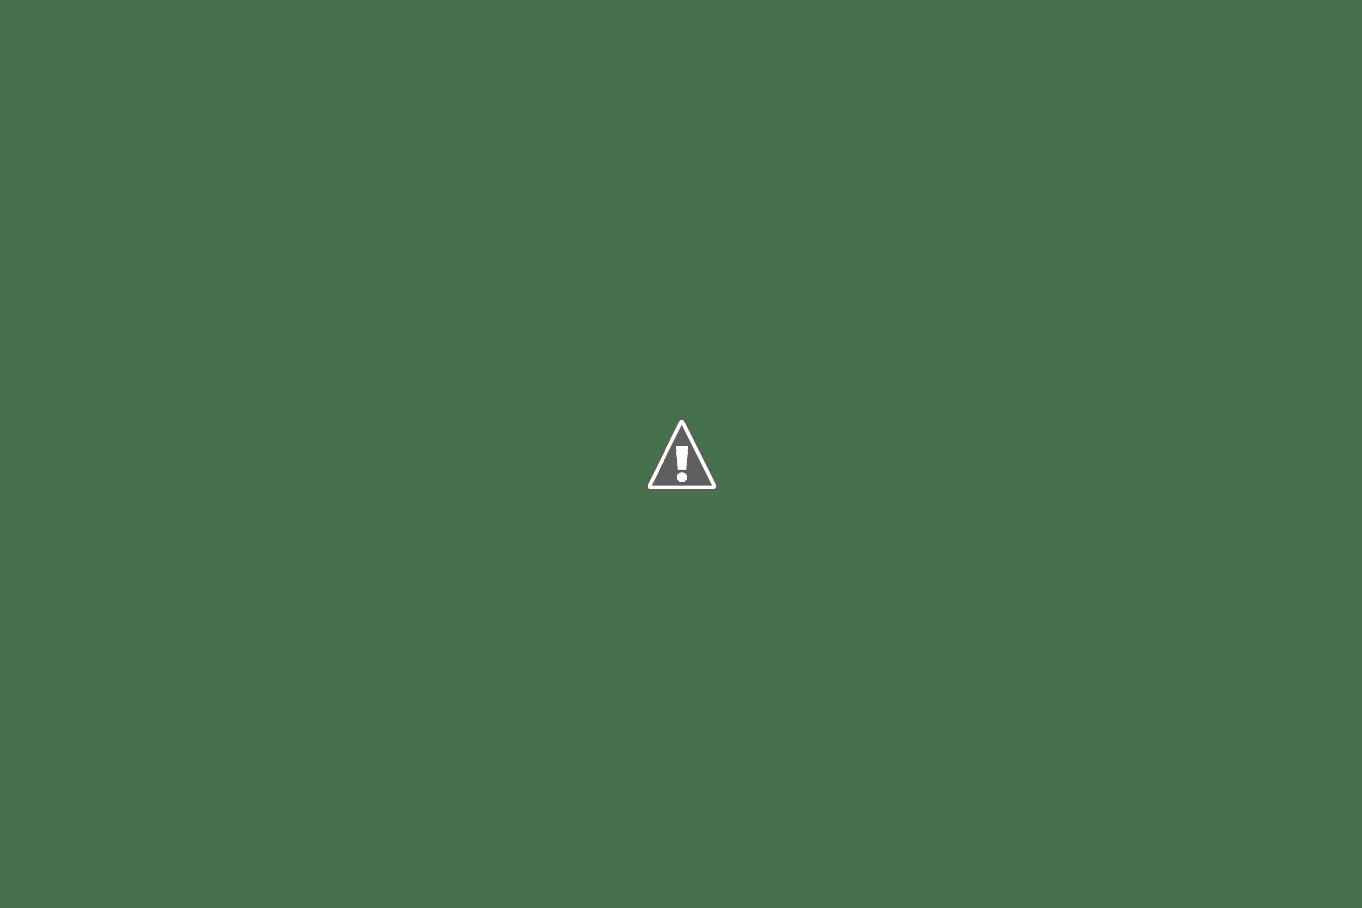 yamaha arius ydp 143 full size digital piano 88 key. Black Bedroom Furniture Sets. Home Design Ideas